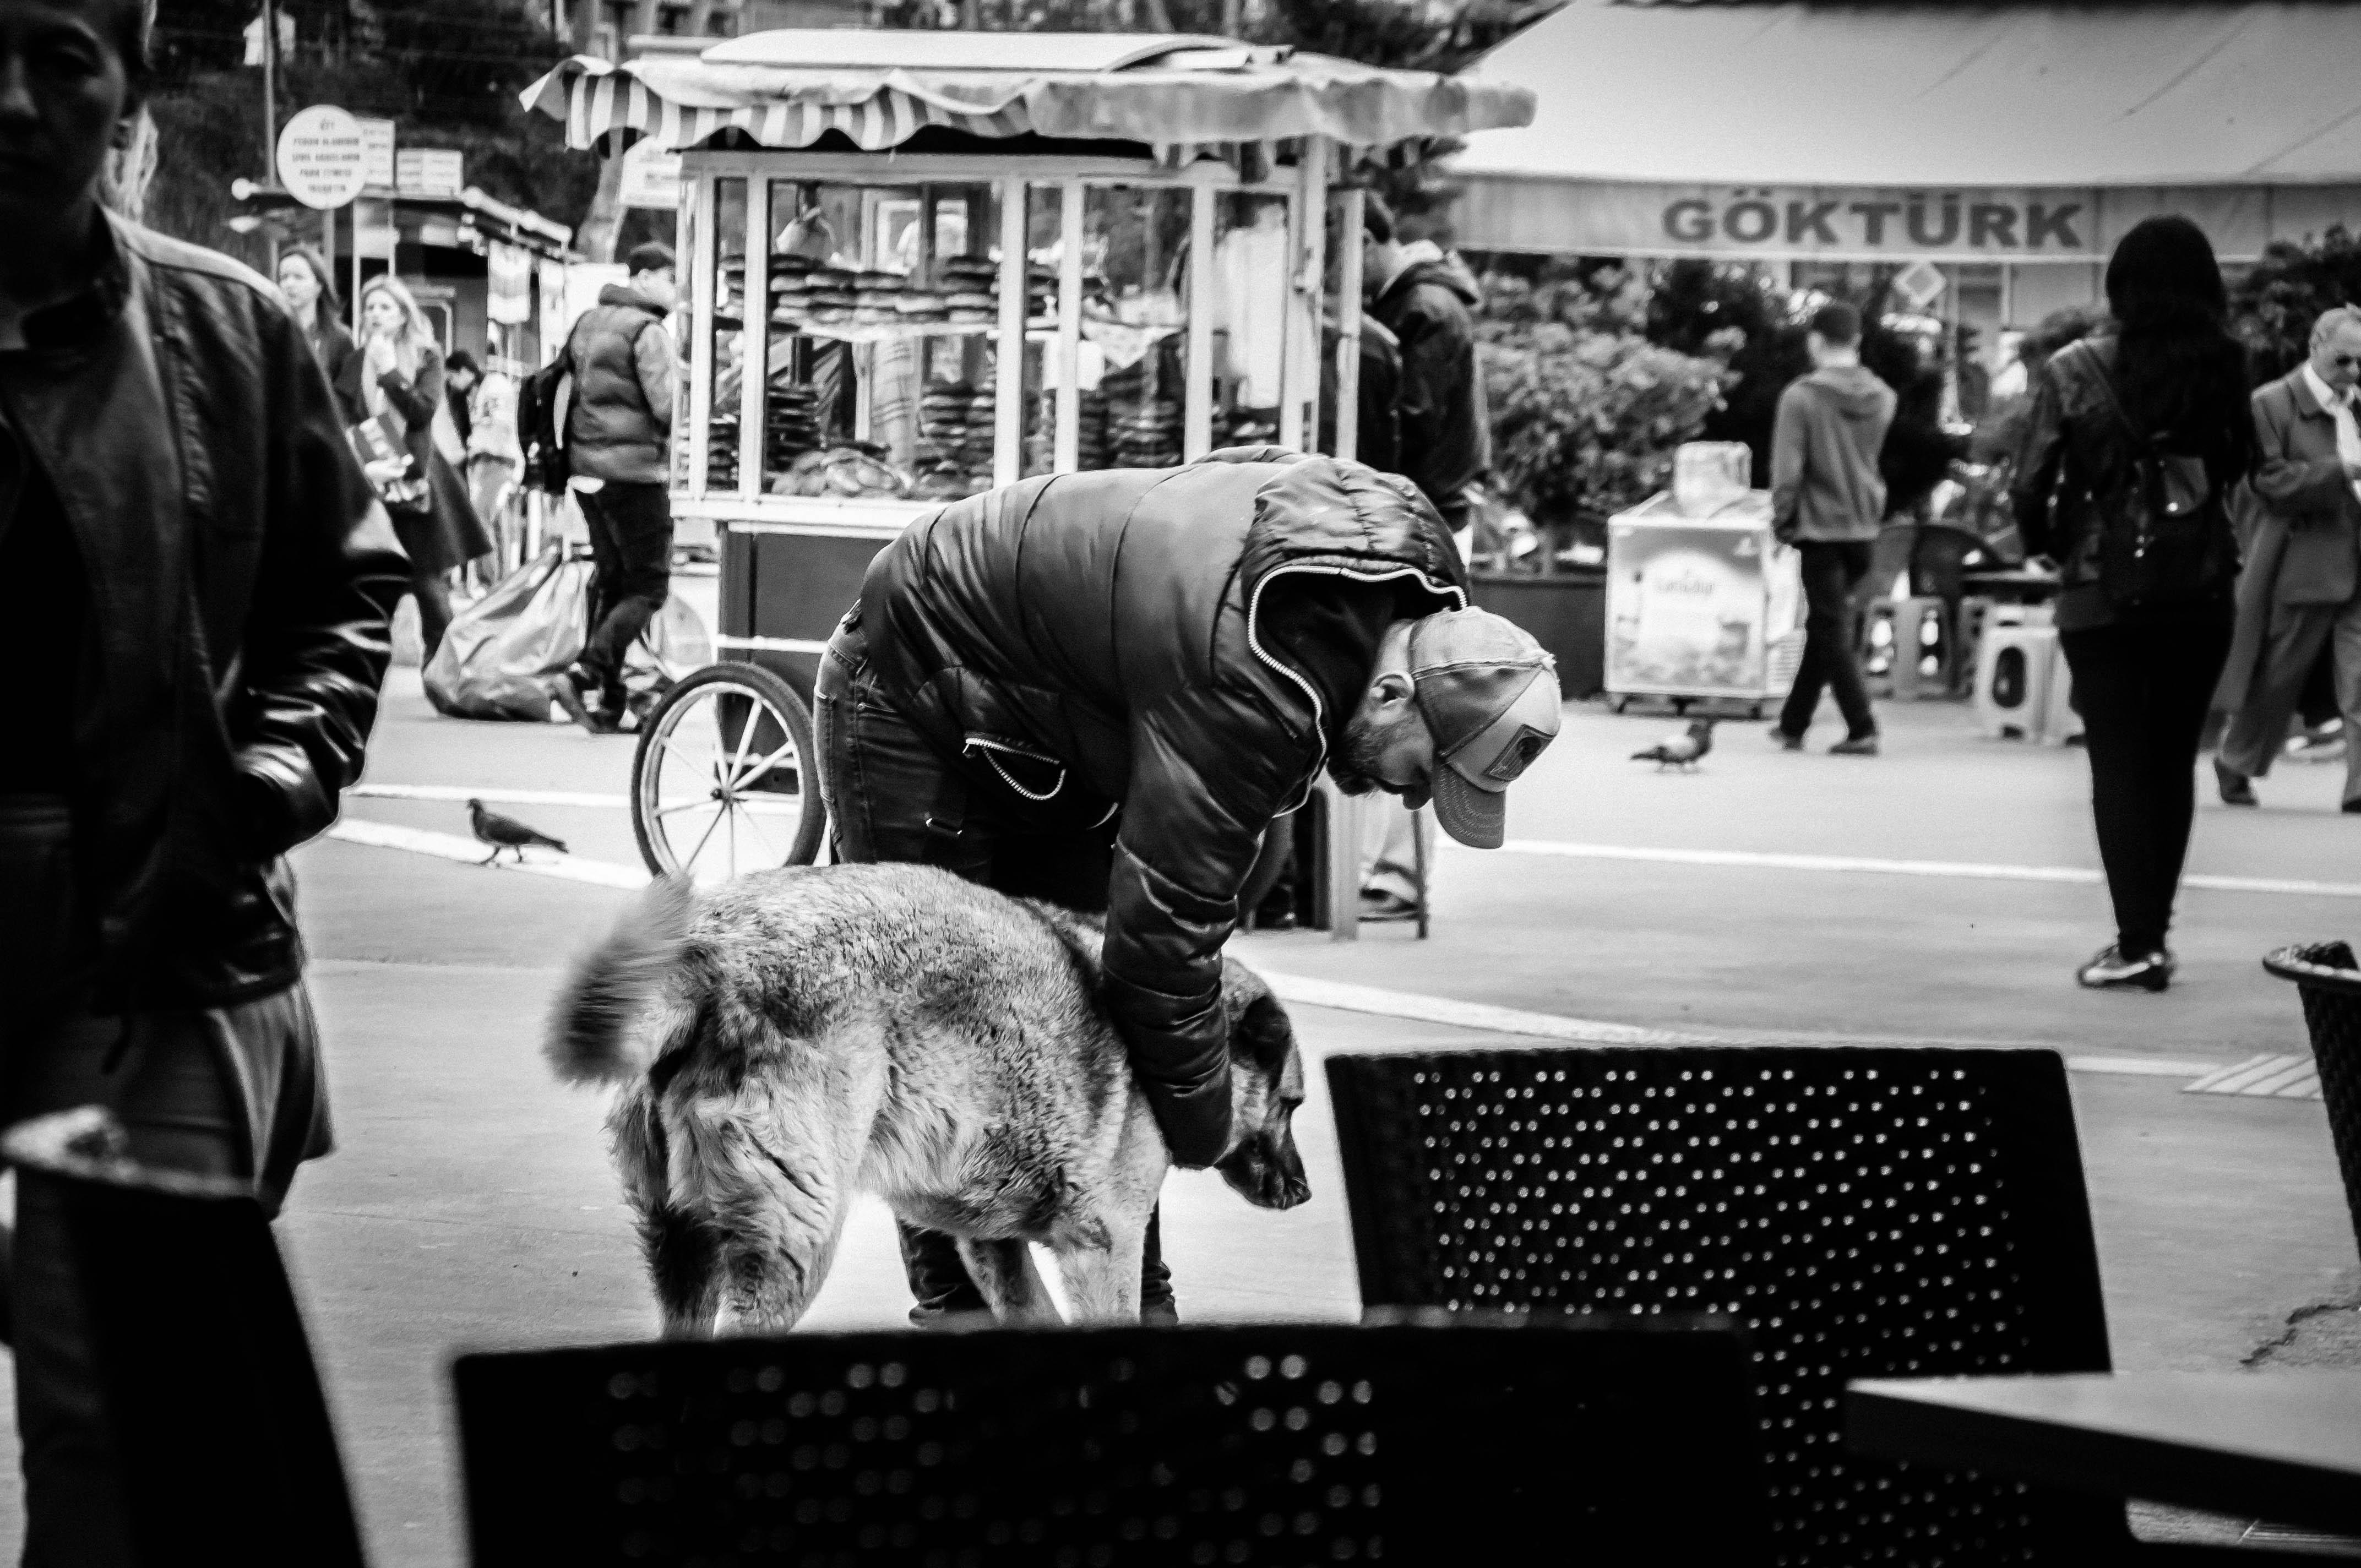 Flickr - Schegge di Istanbul, cani & gente